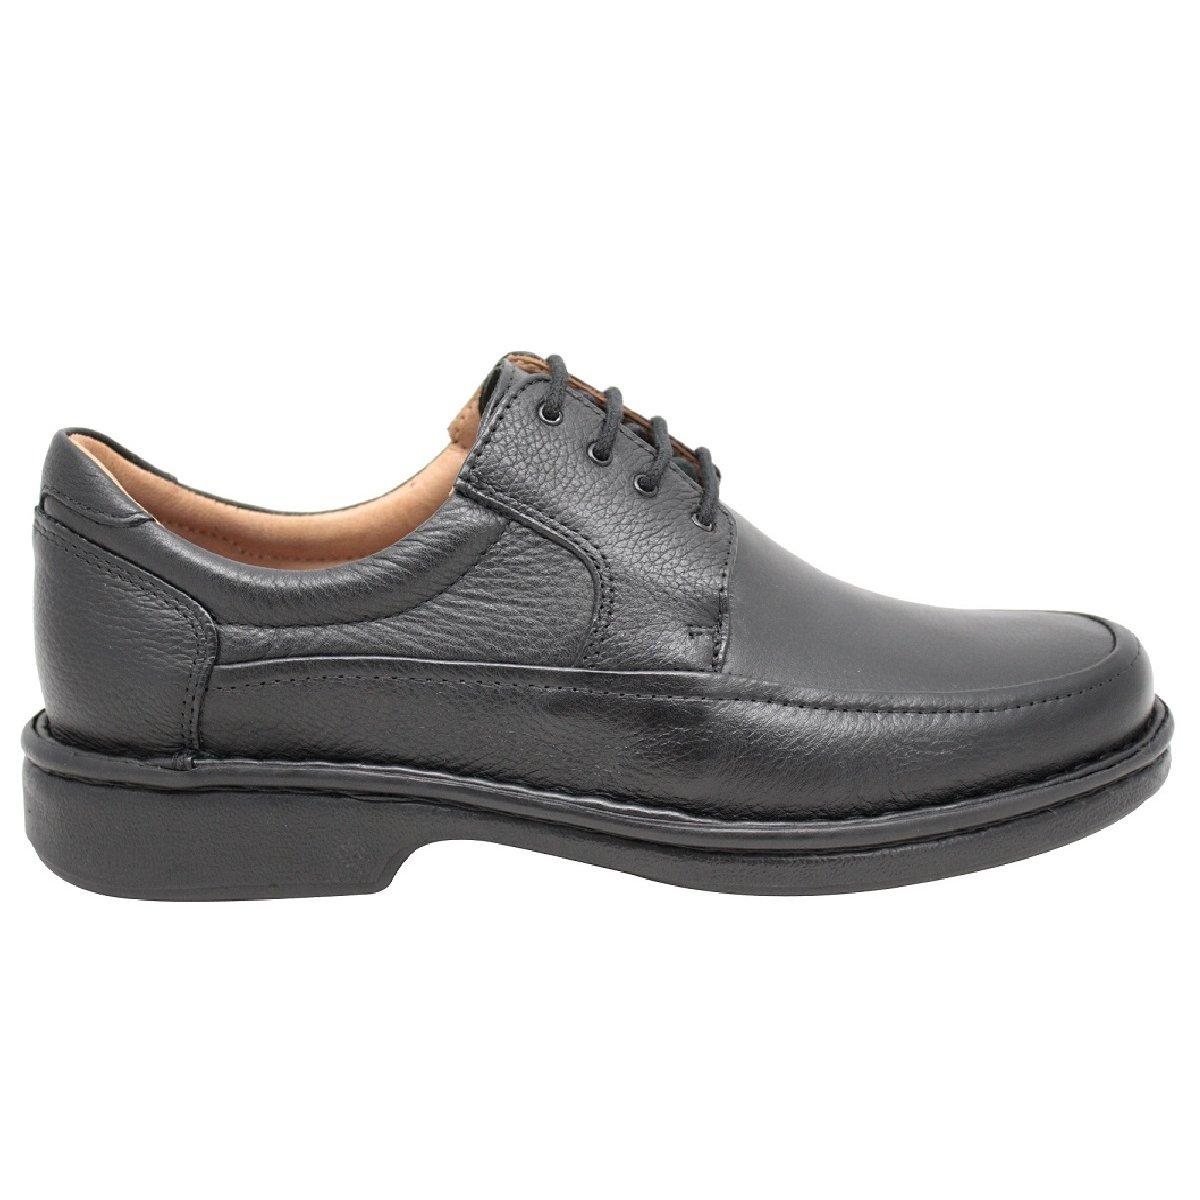 Sapato Sapato Masculino Shoes Masculino Atron Preto Social Shoes Social Atron qvrxvwnSI6